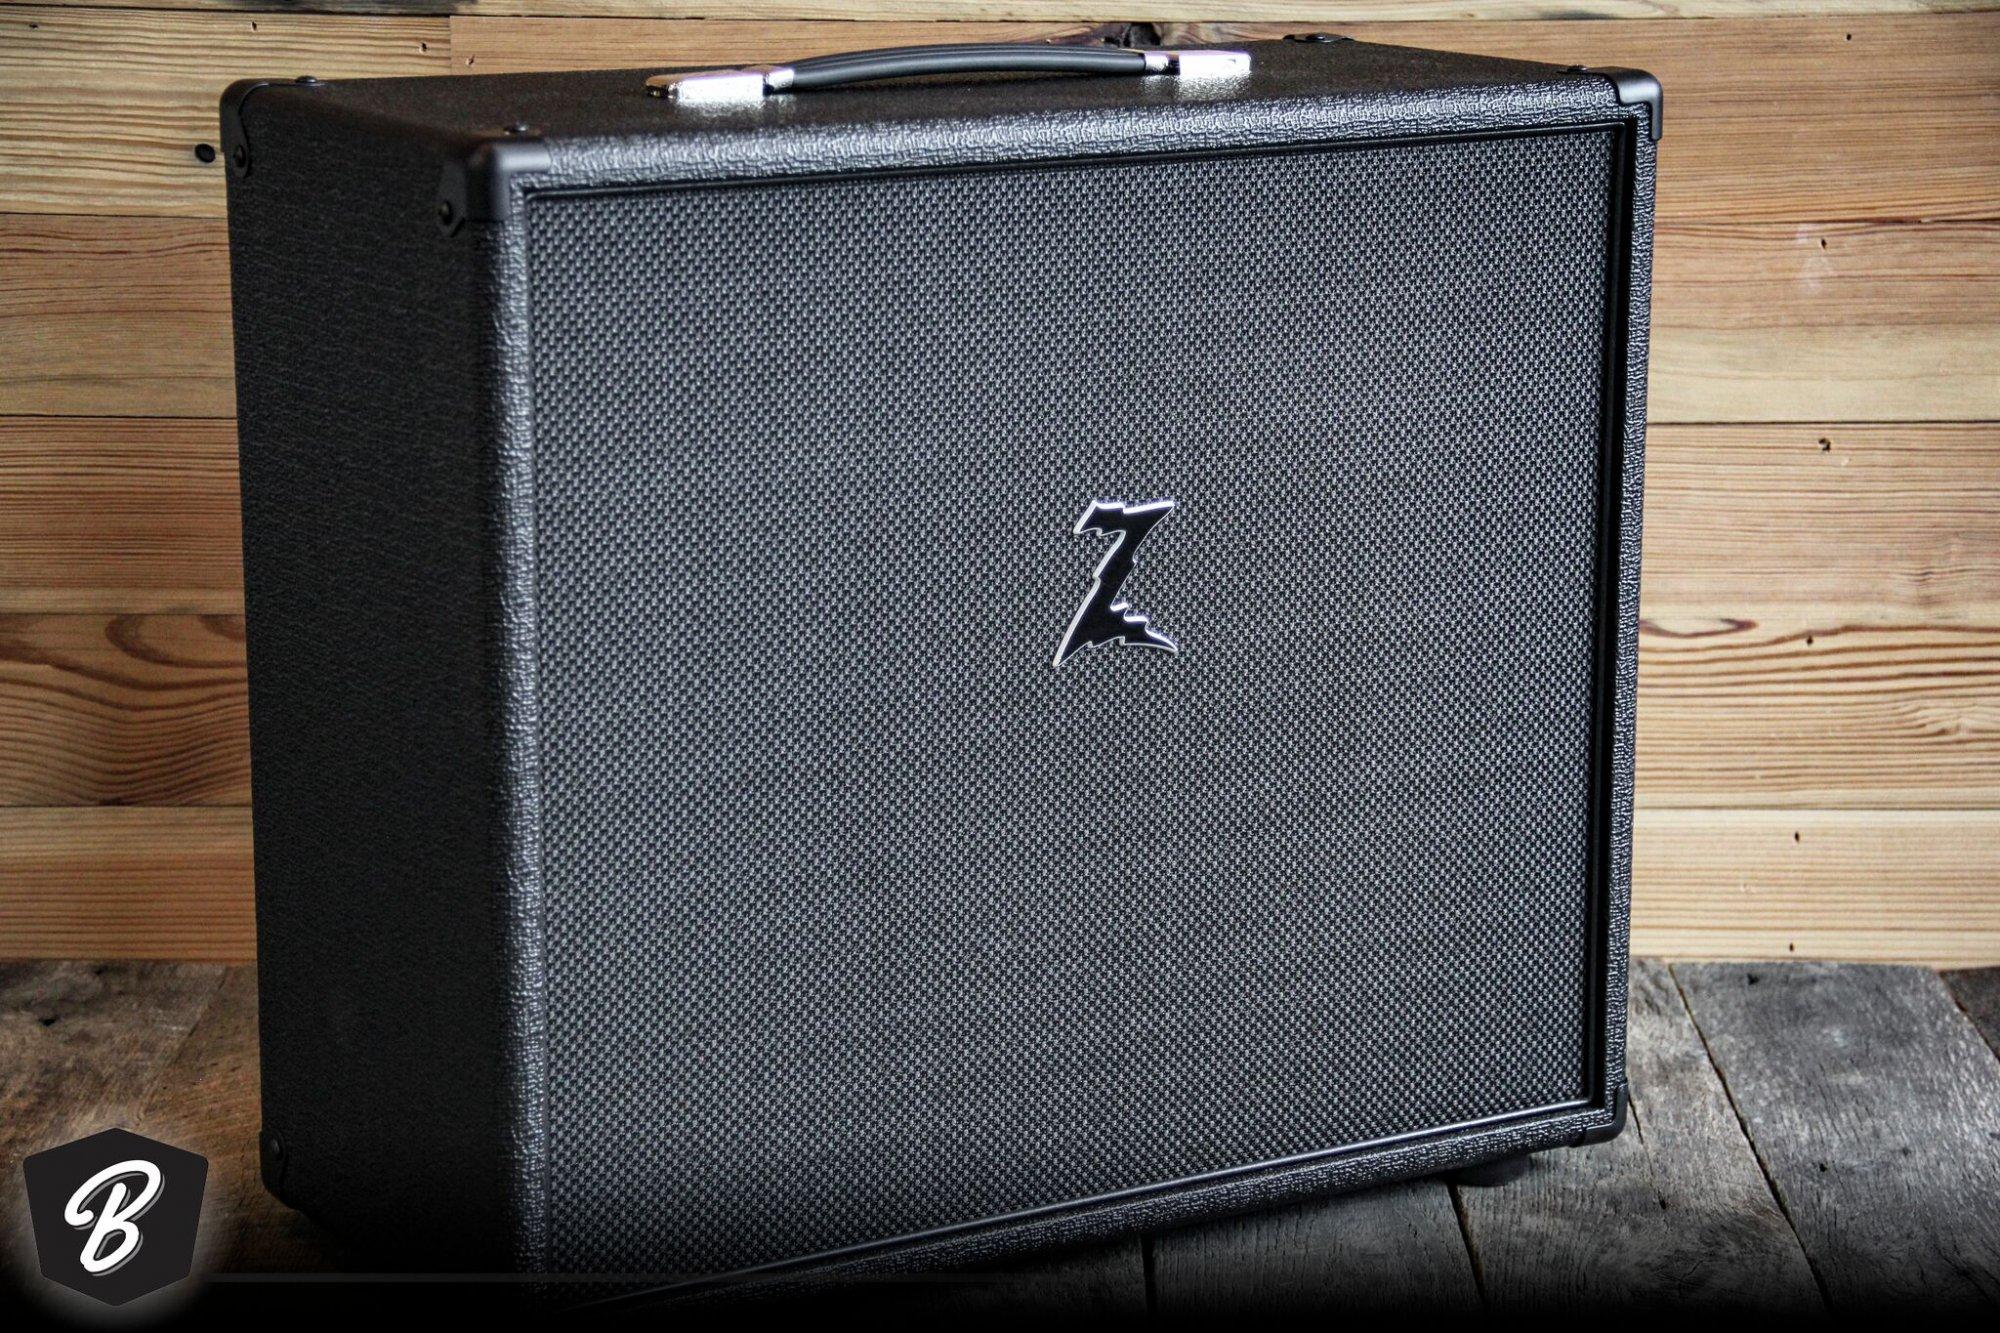 Dr. Z 1 x 12 Cab V30 Speaker in Blackout!